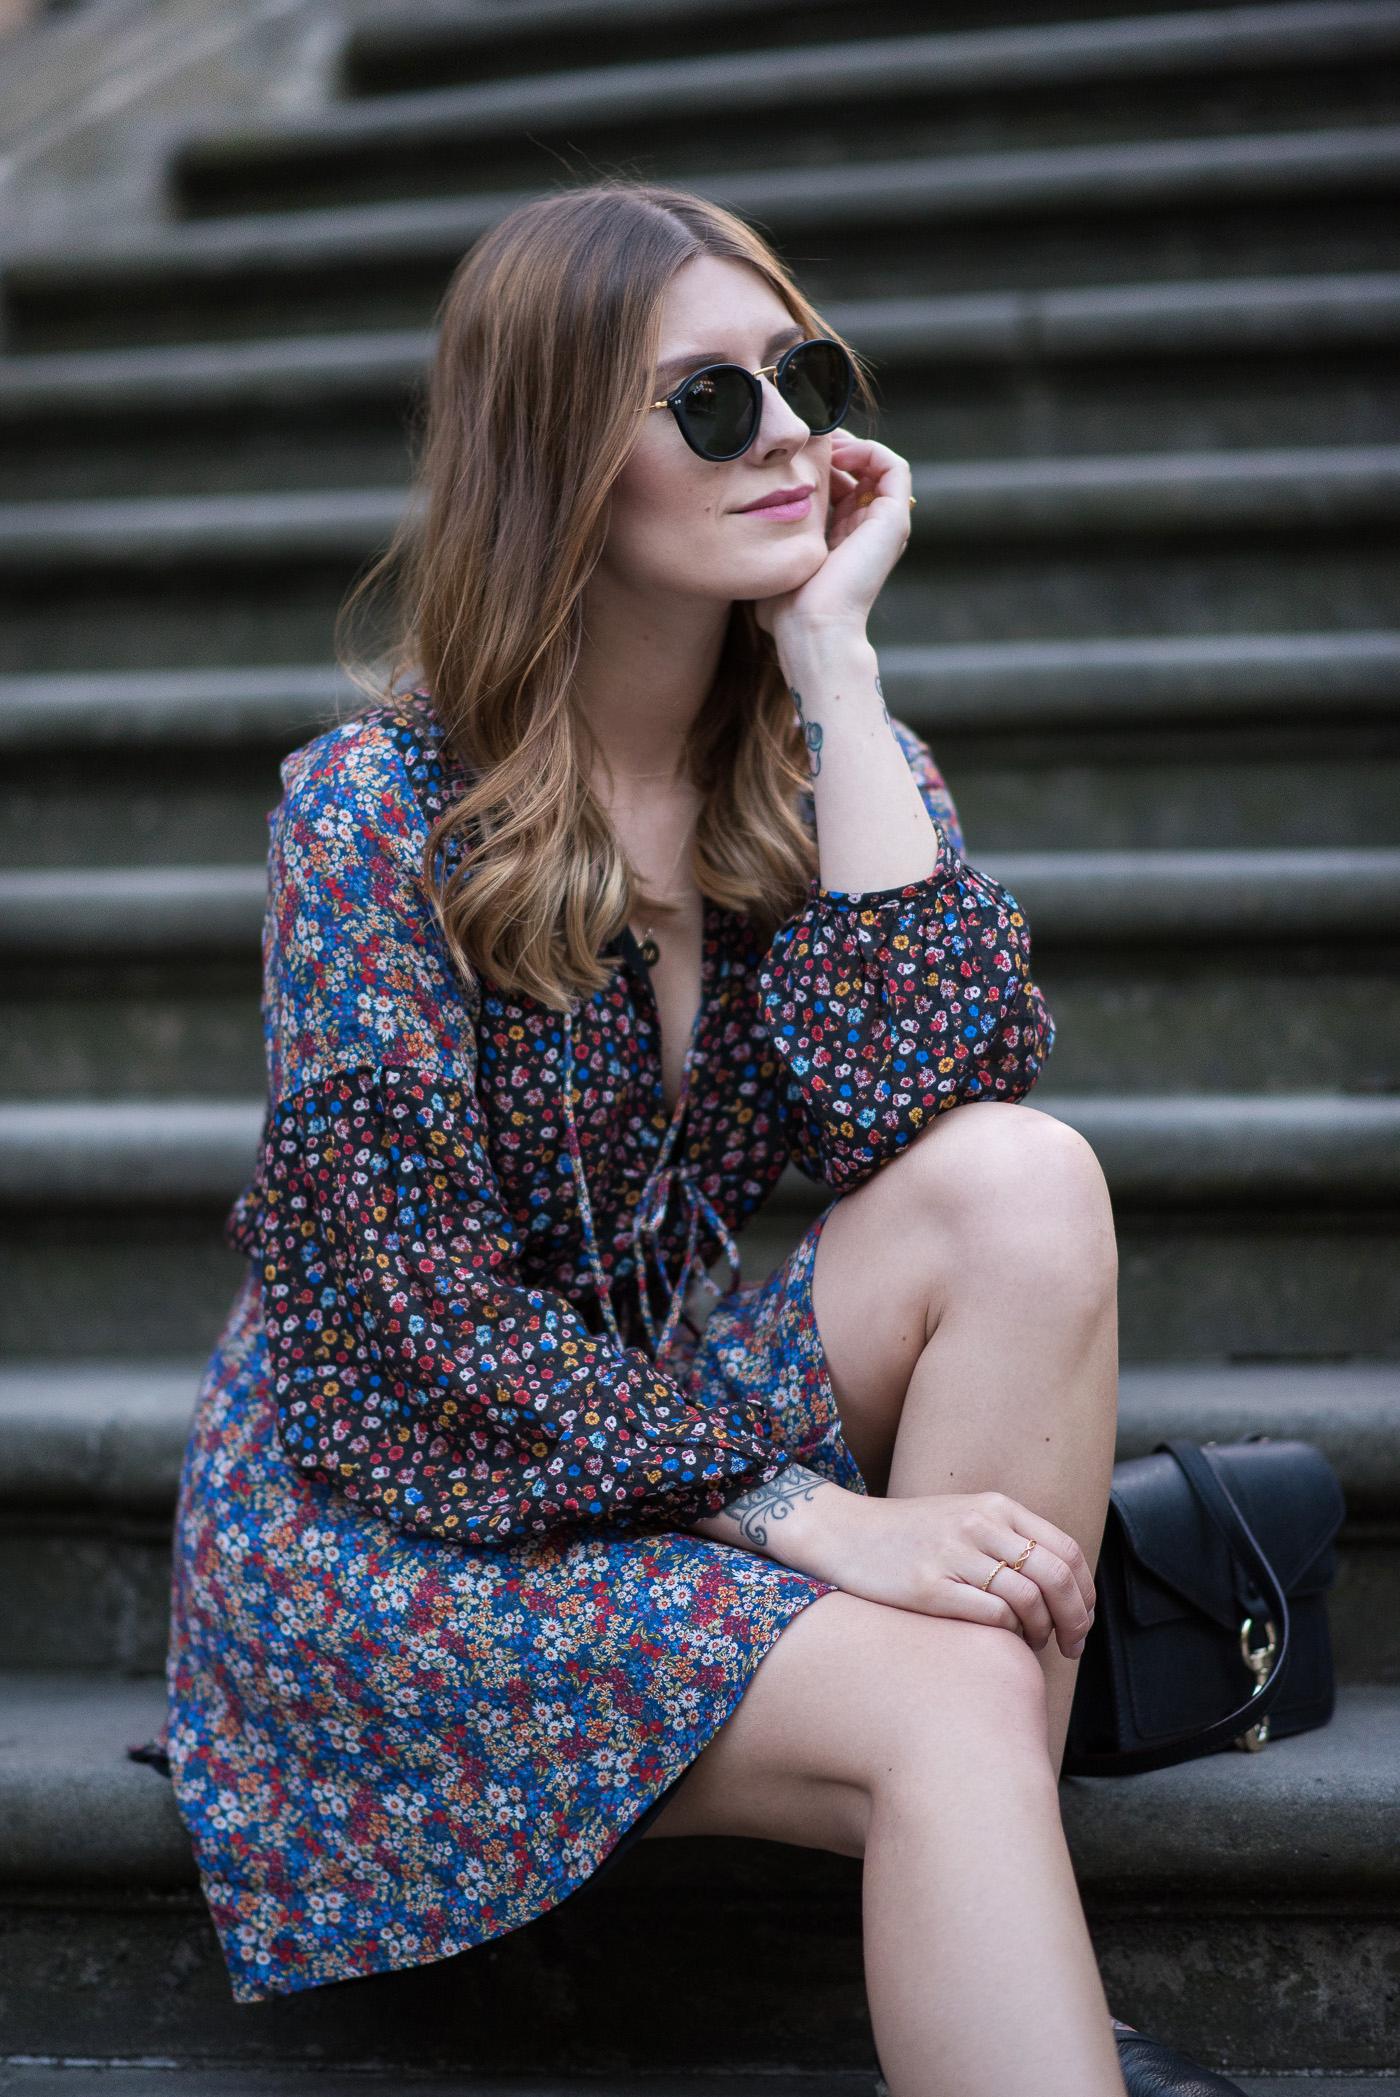 Floral_Summer_Dress_Berlin_Outfit_6